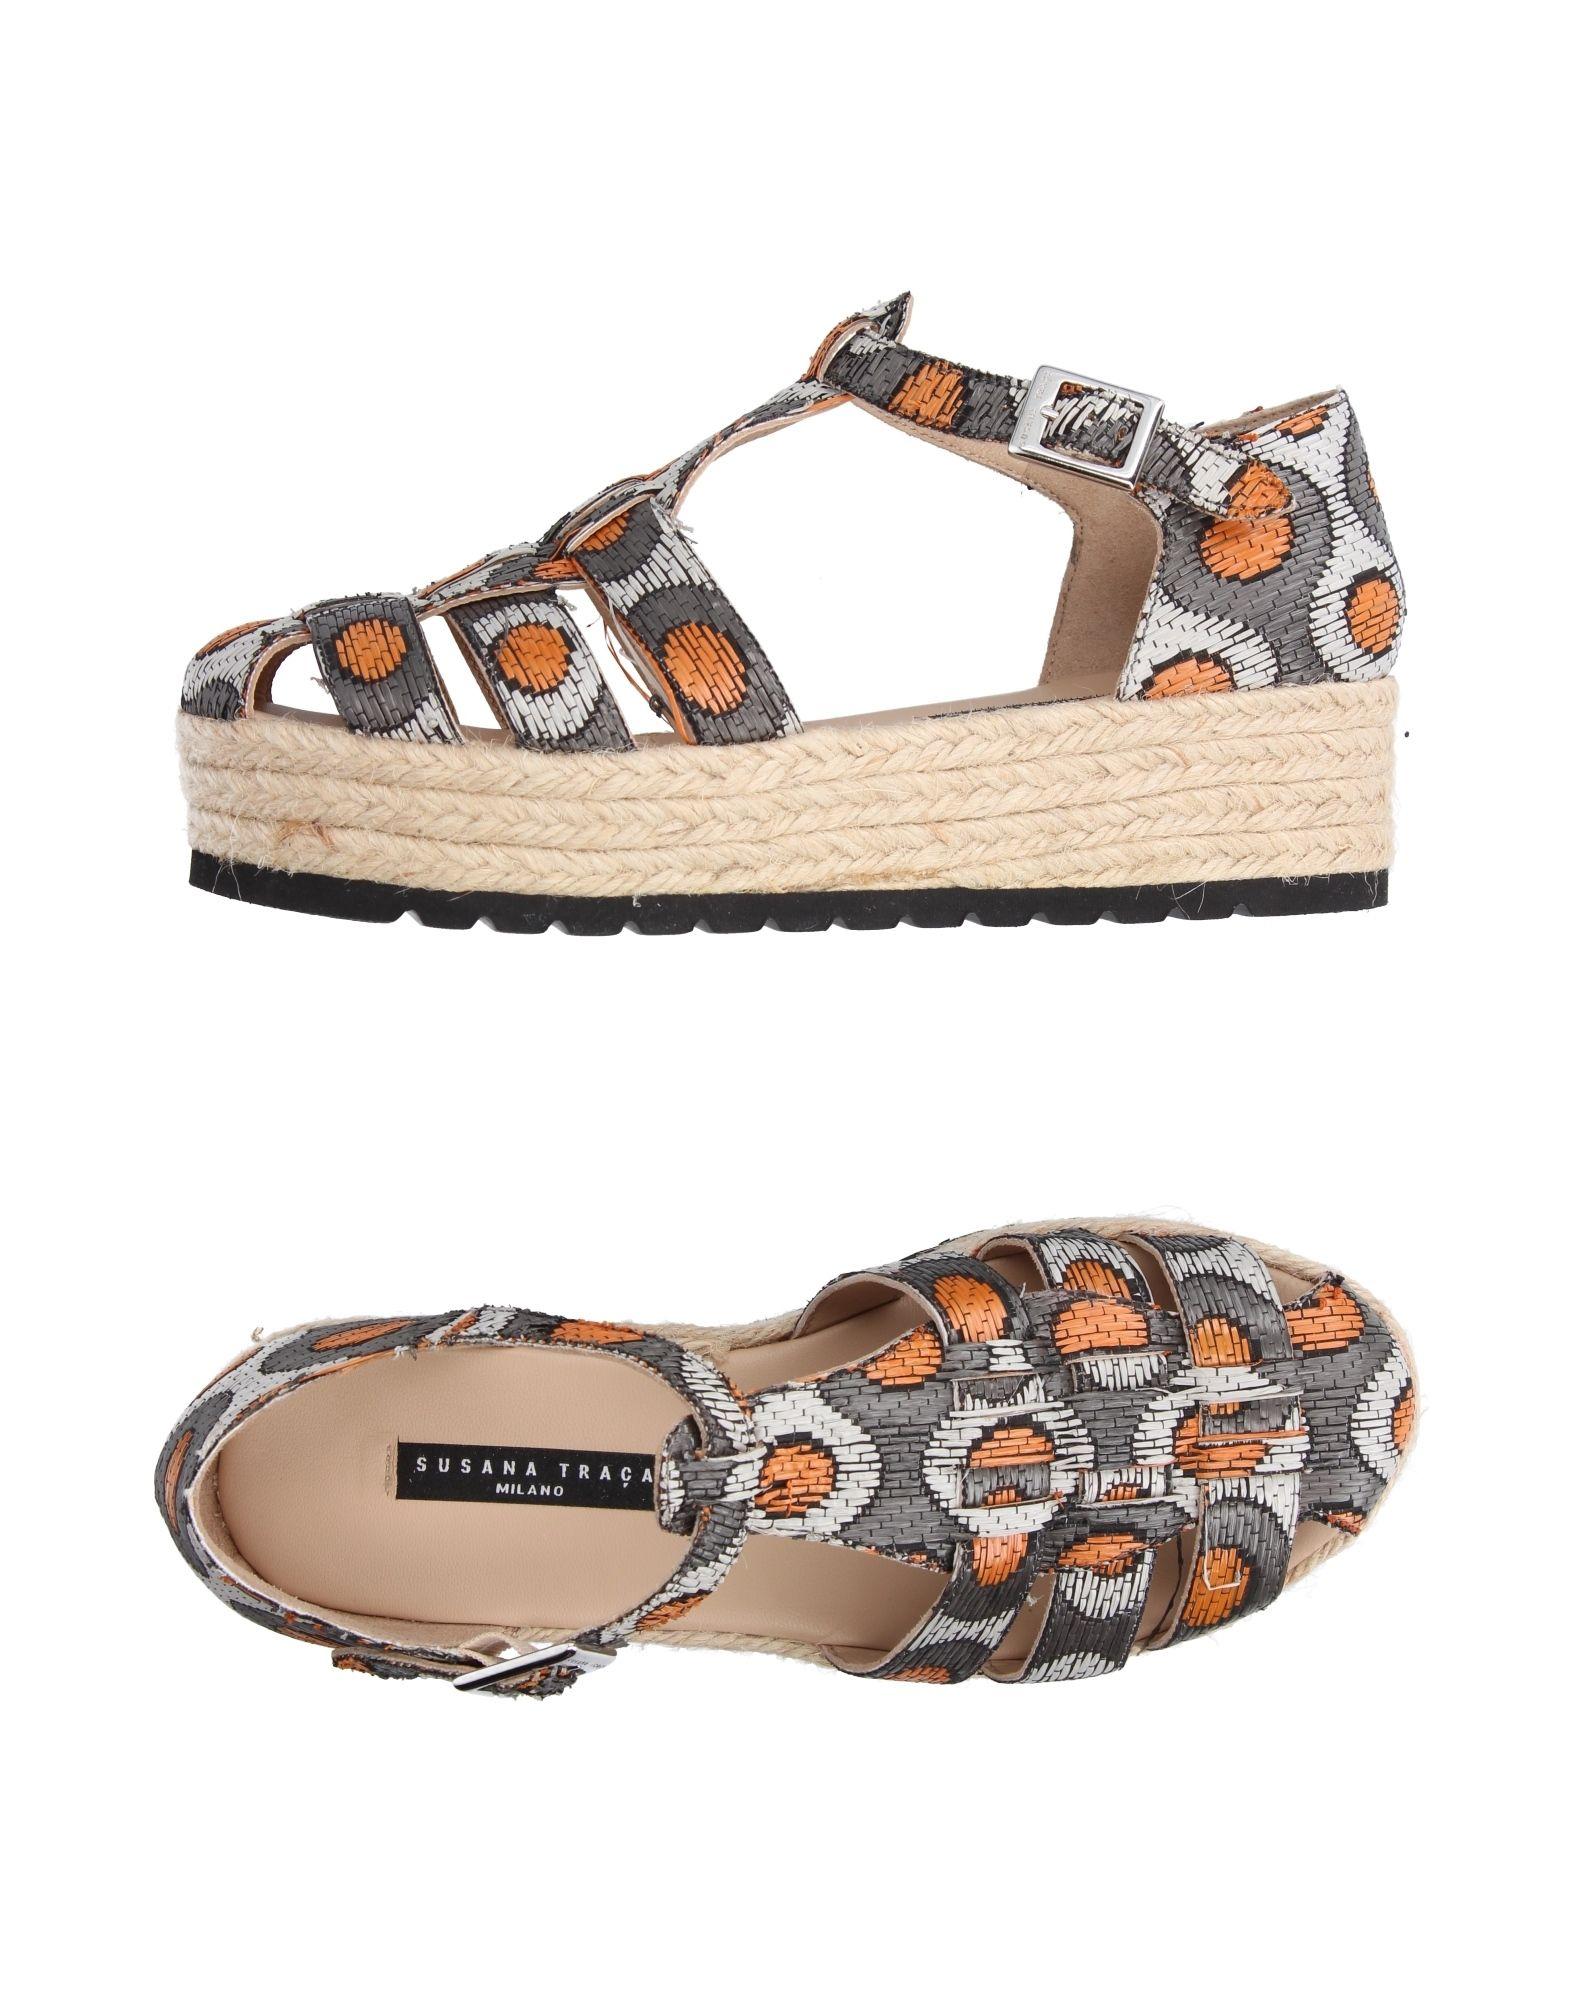 Gut Traca um billige Schuhe zu tragenSusana Traca Gut Sandalen Damen  11229304OM 177530